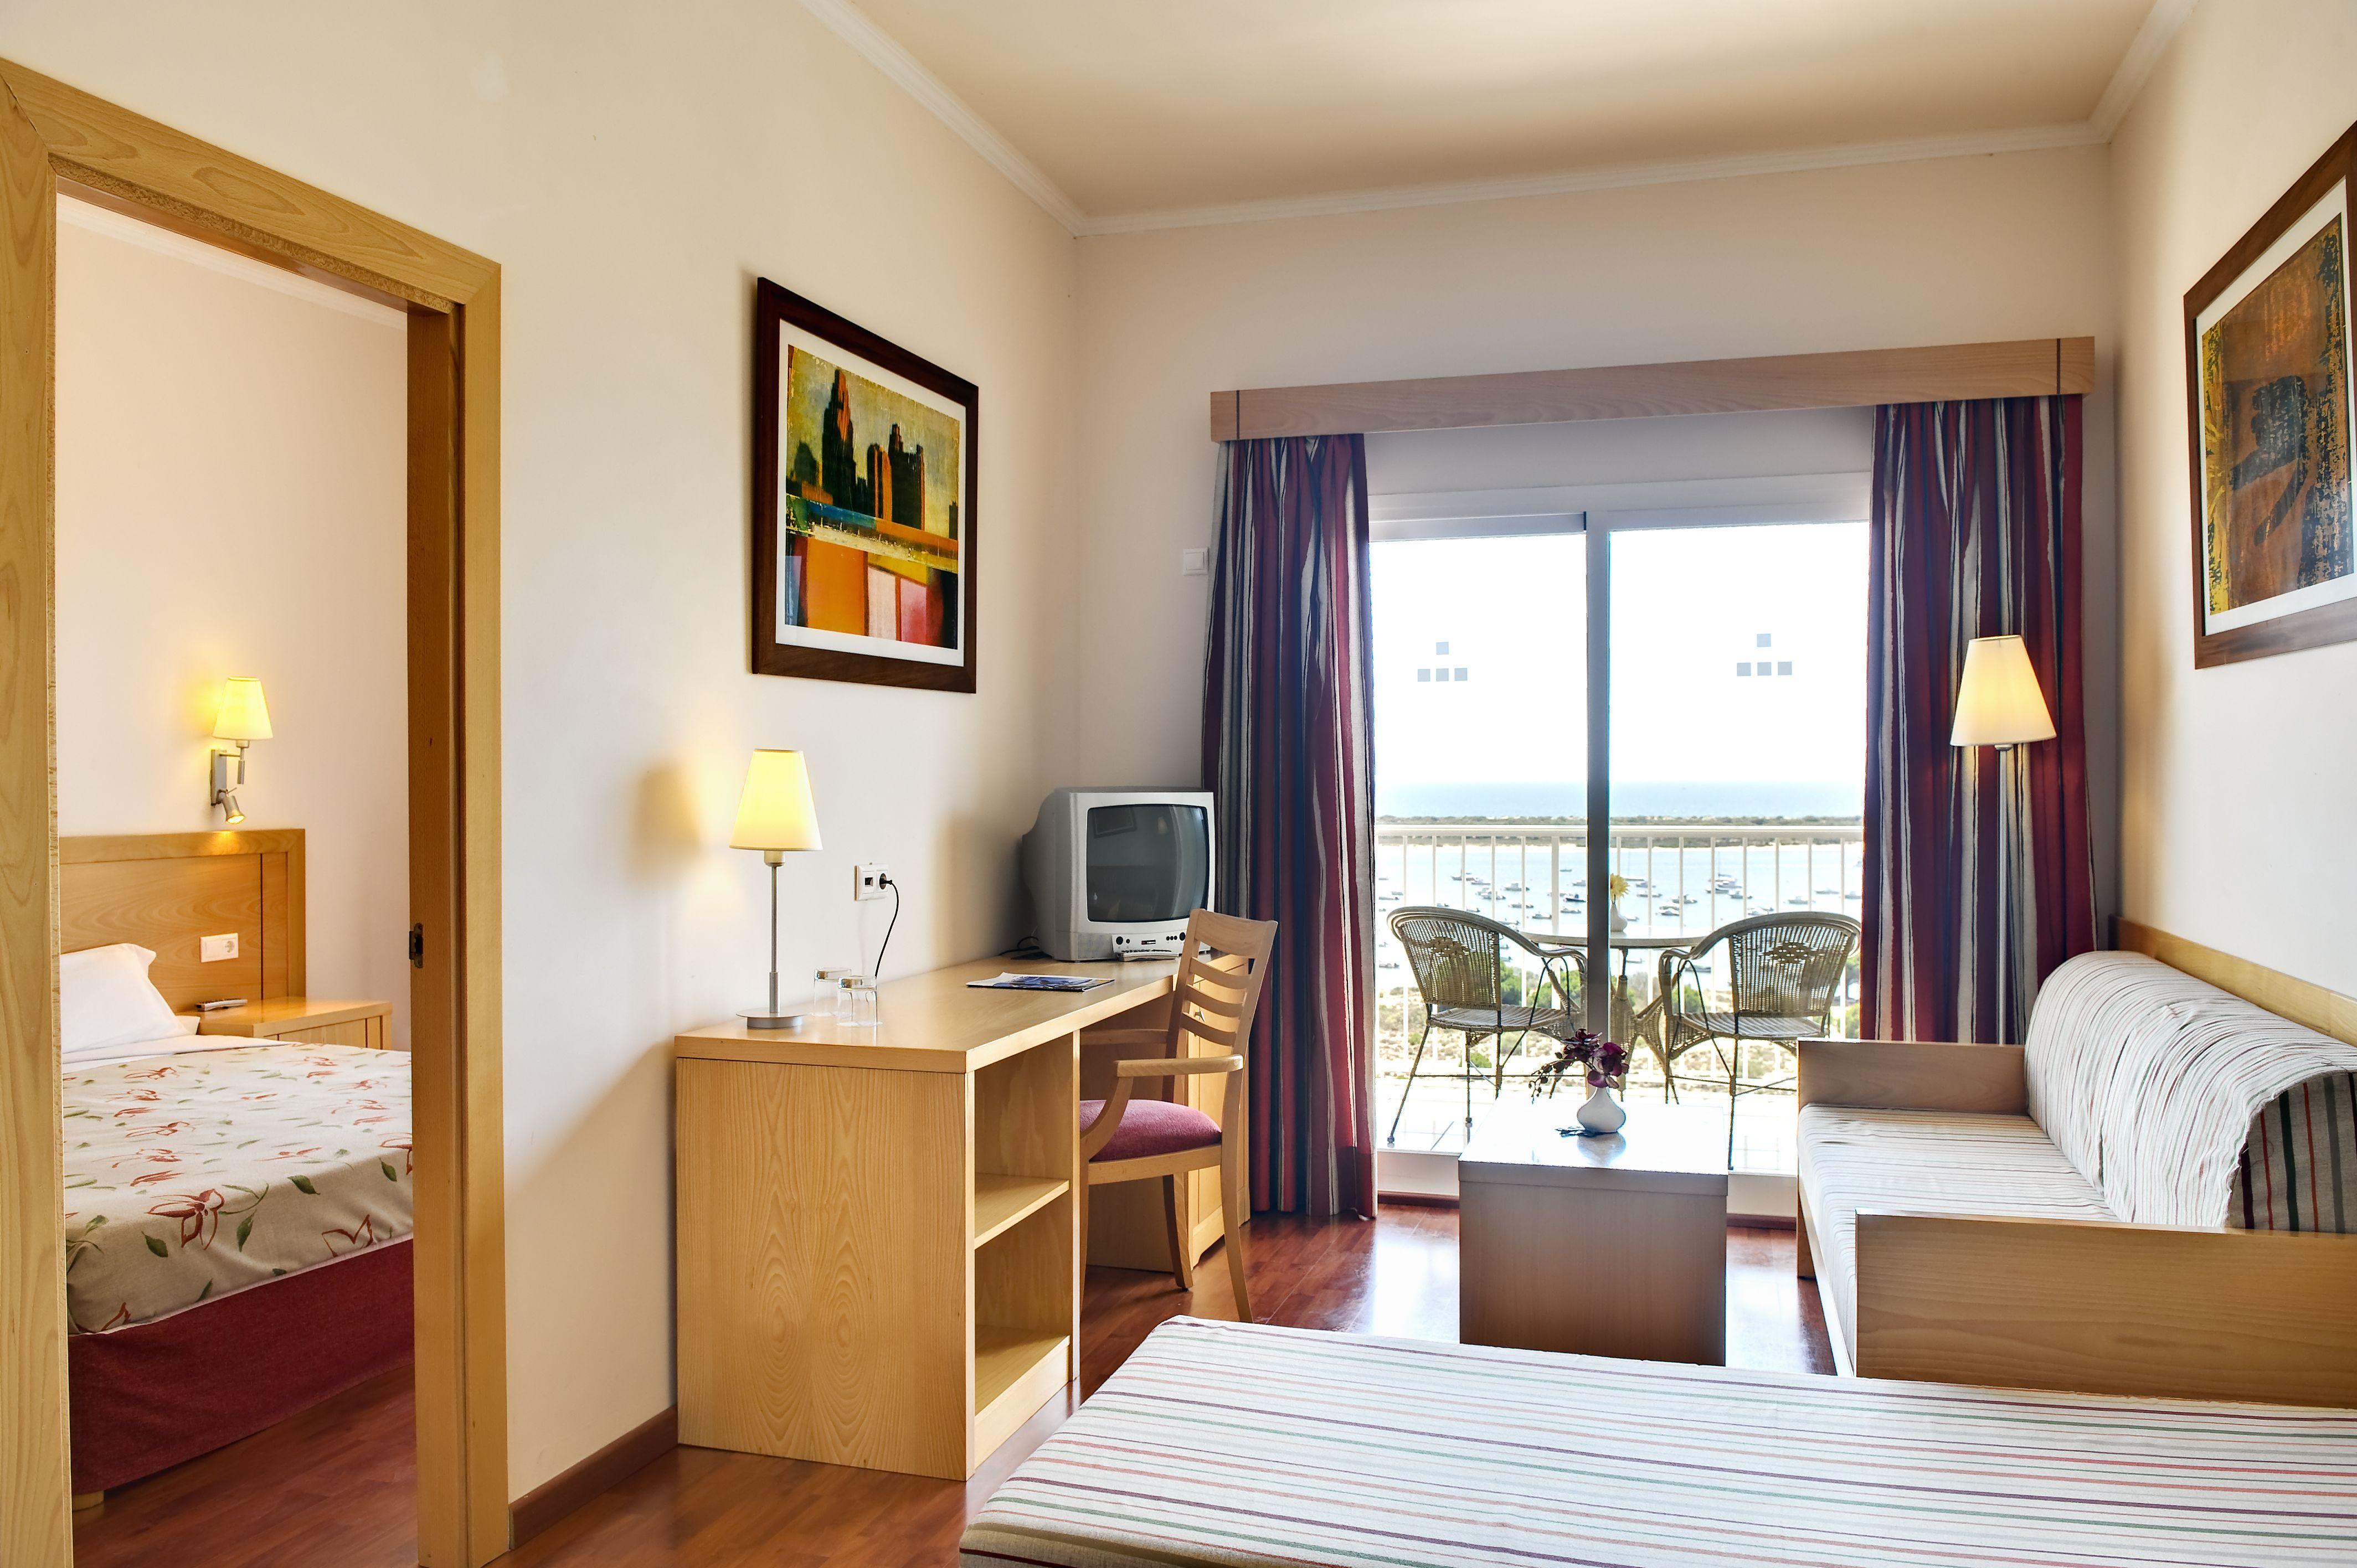 Garden Playanatural Hotel Spa Gardenhotels Andalucía Huelva Adultsonly Hotel Hoteles